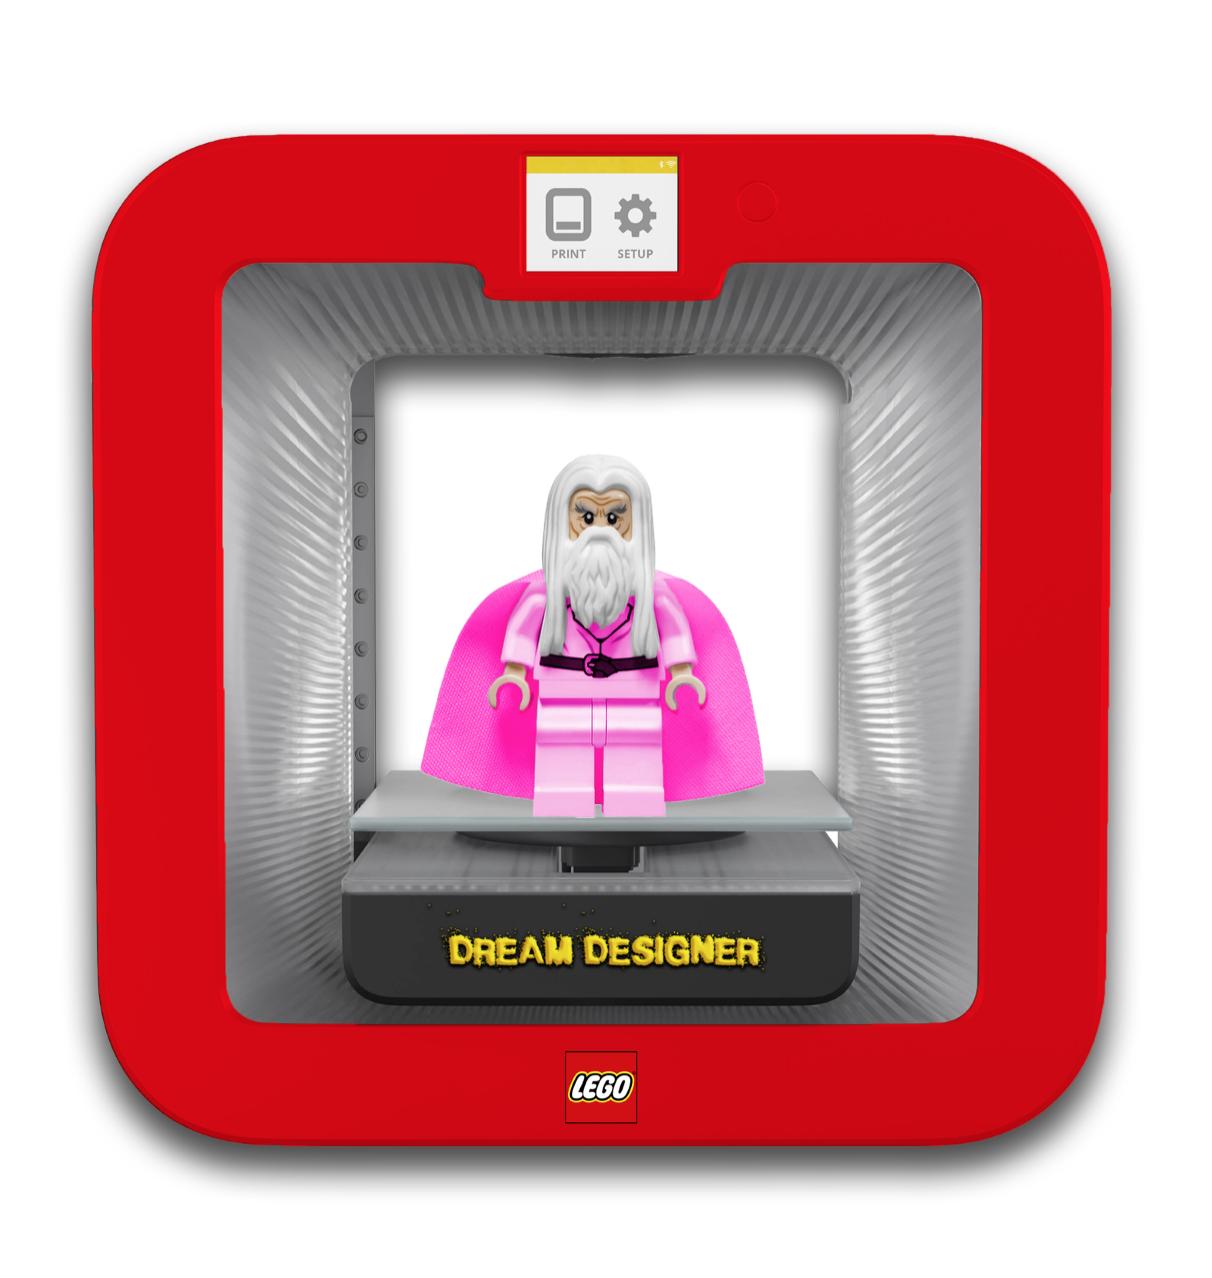 DREAMDESIGNER-small.png